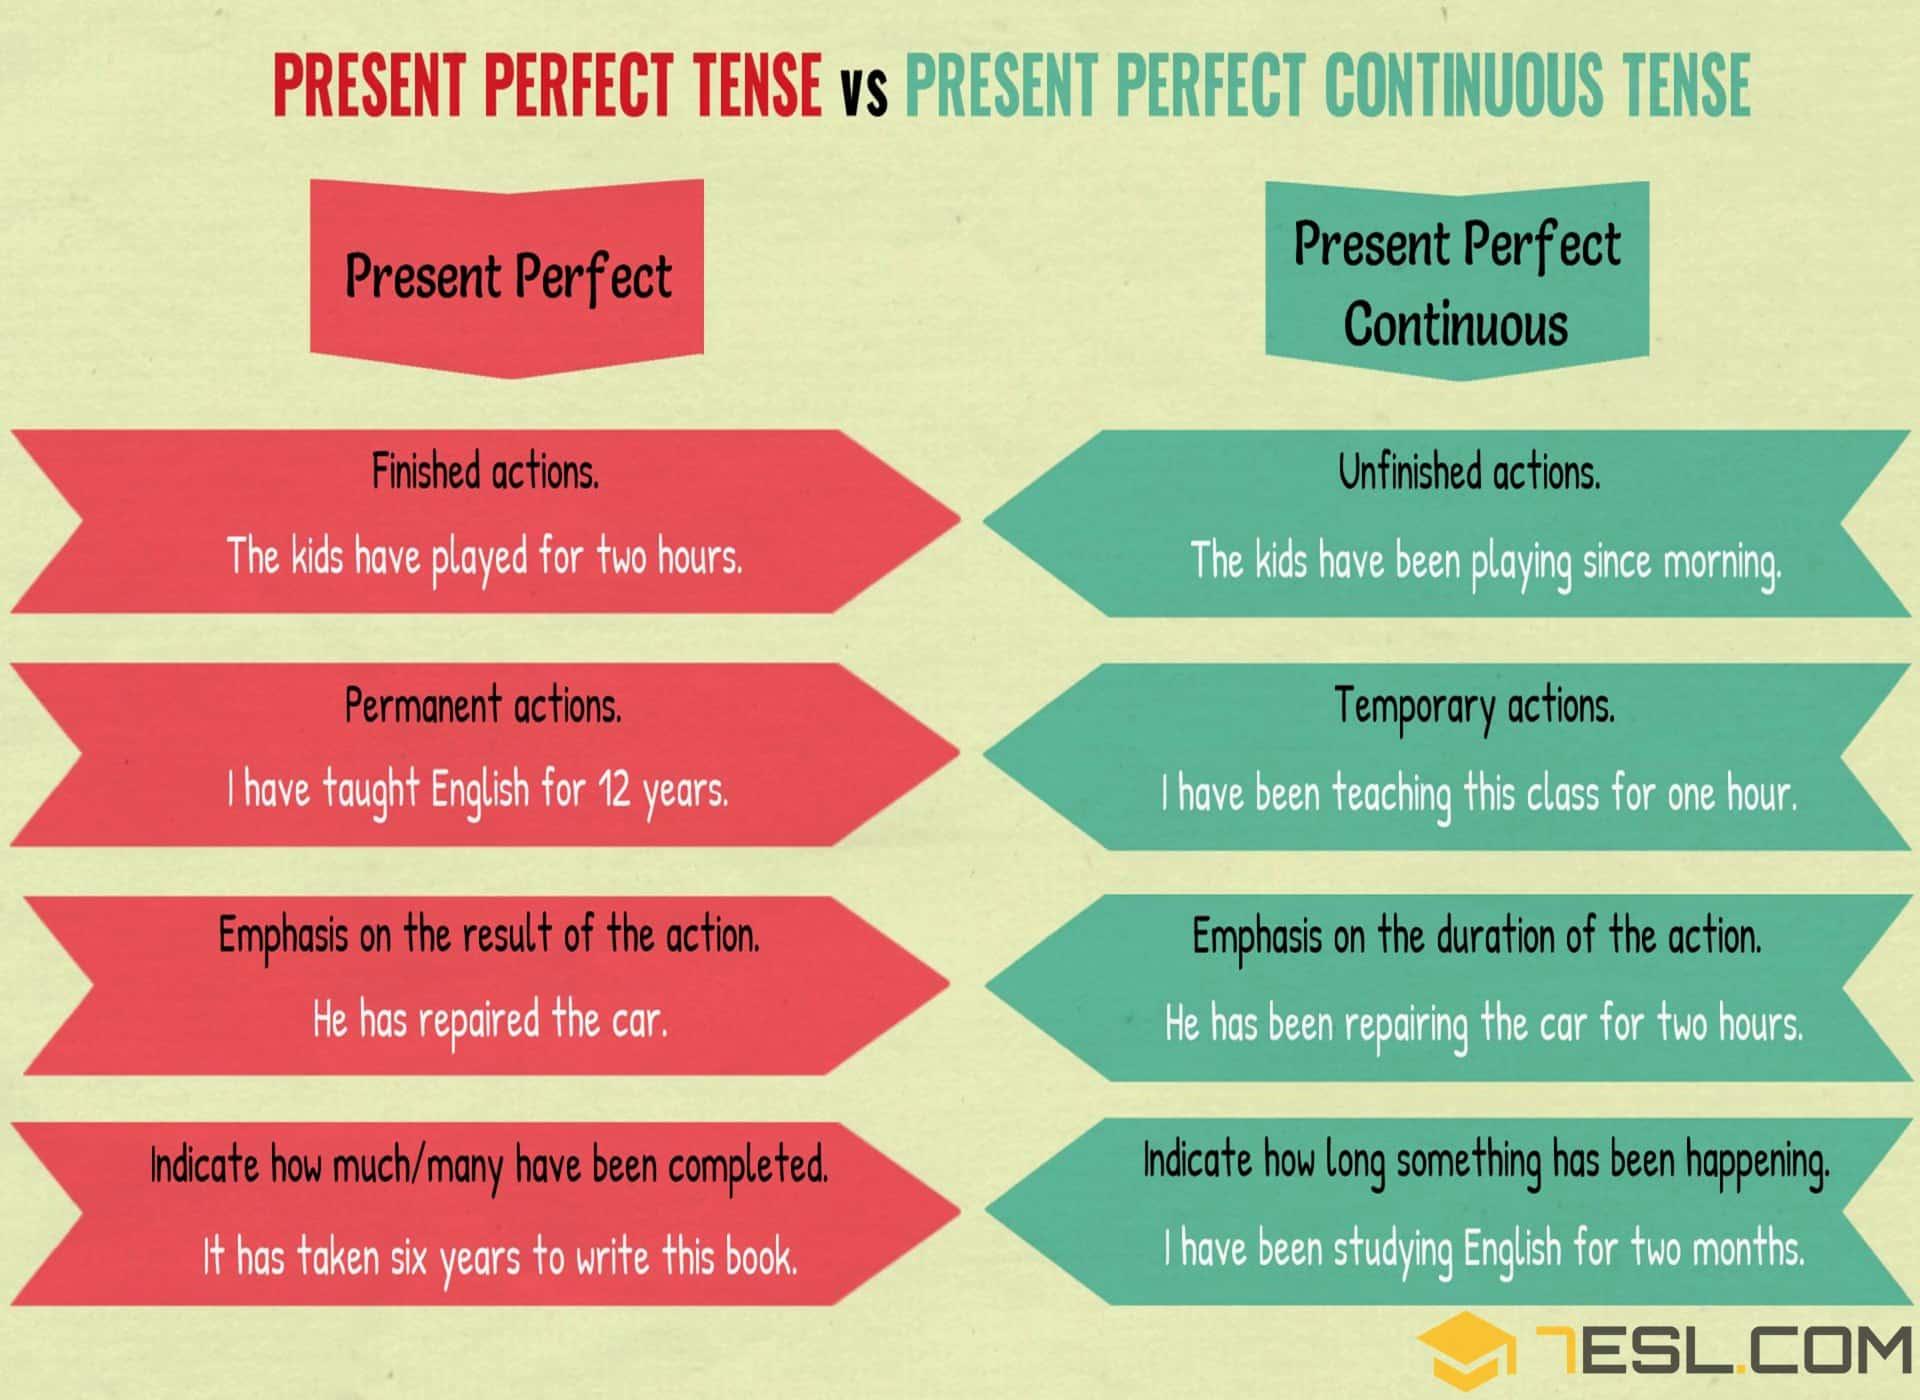 Present Perfect Tense Vs Present Perfect Continuous Tense